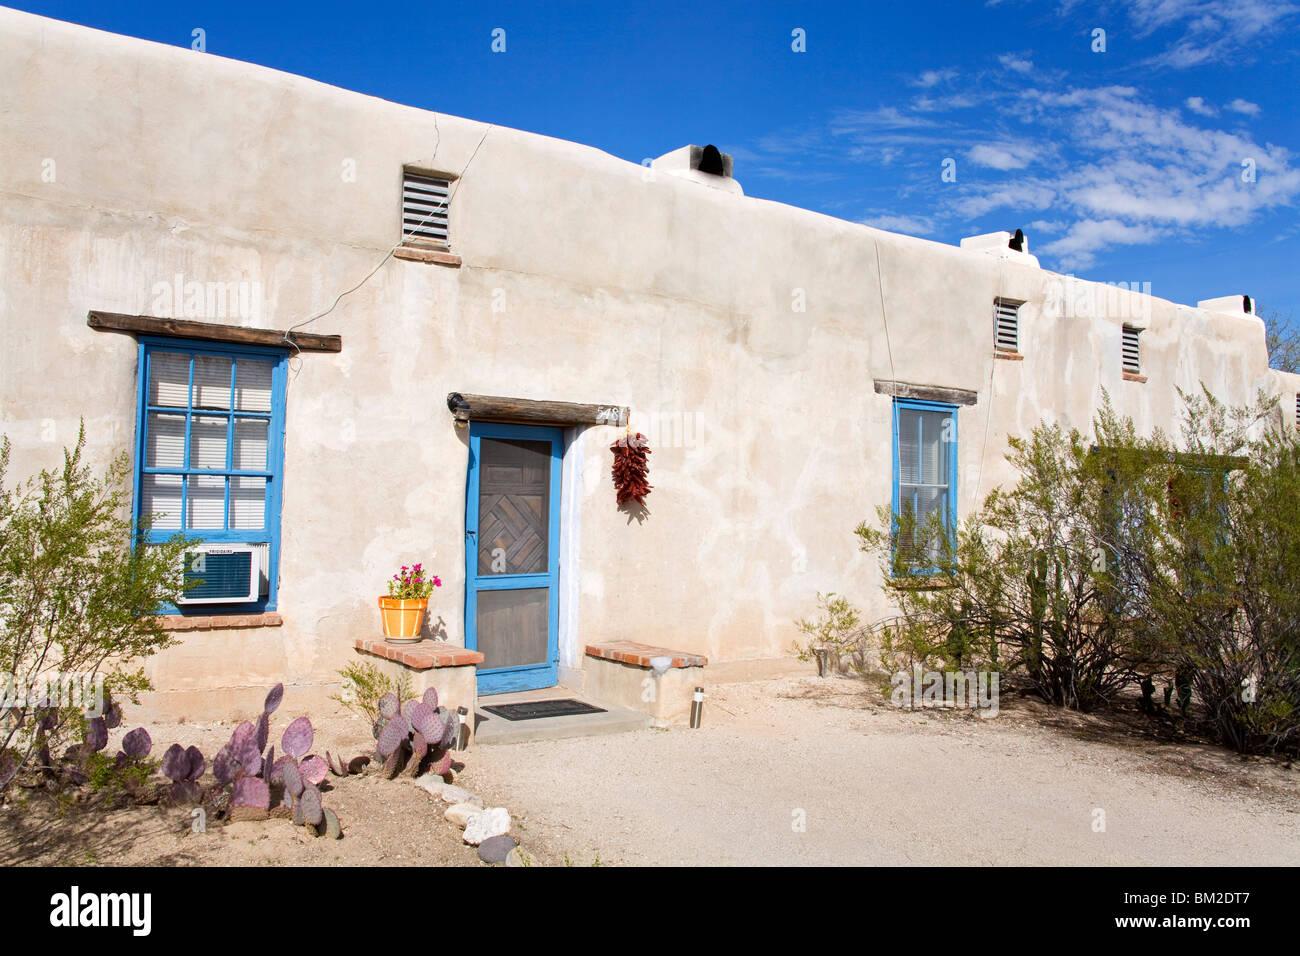 Adobe House, Fort Lowell Historic District, Tucson, Arizona, USA - Stock Image